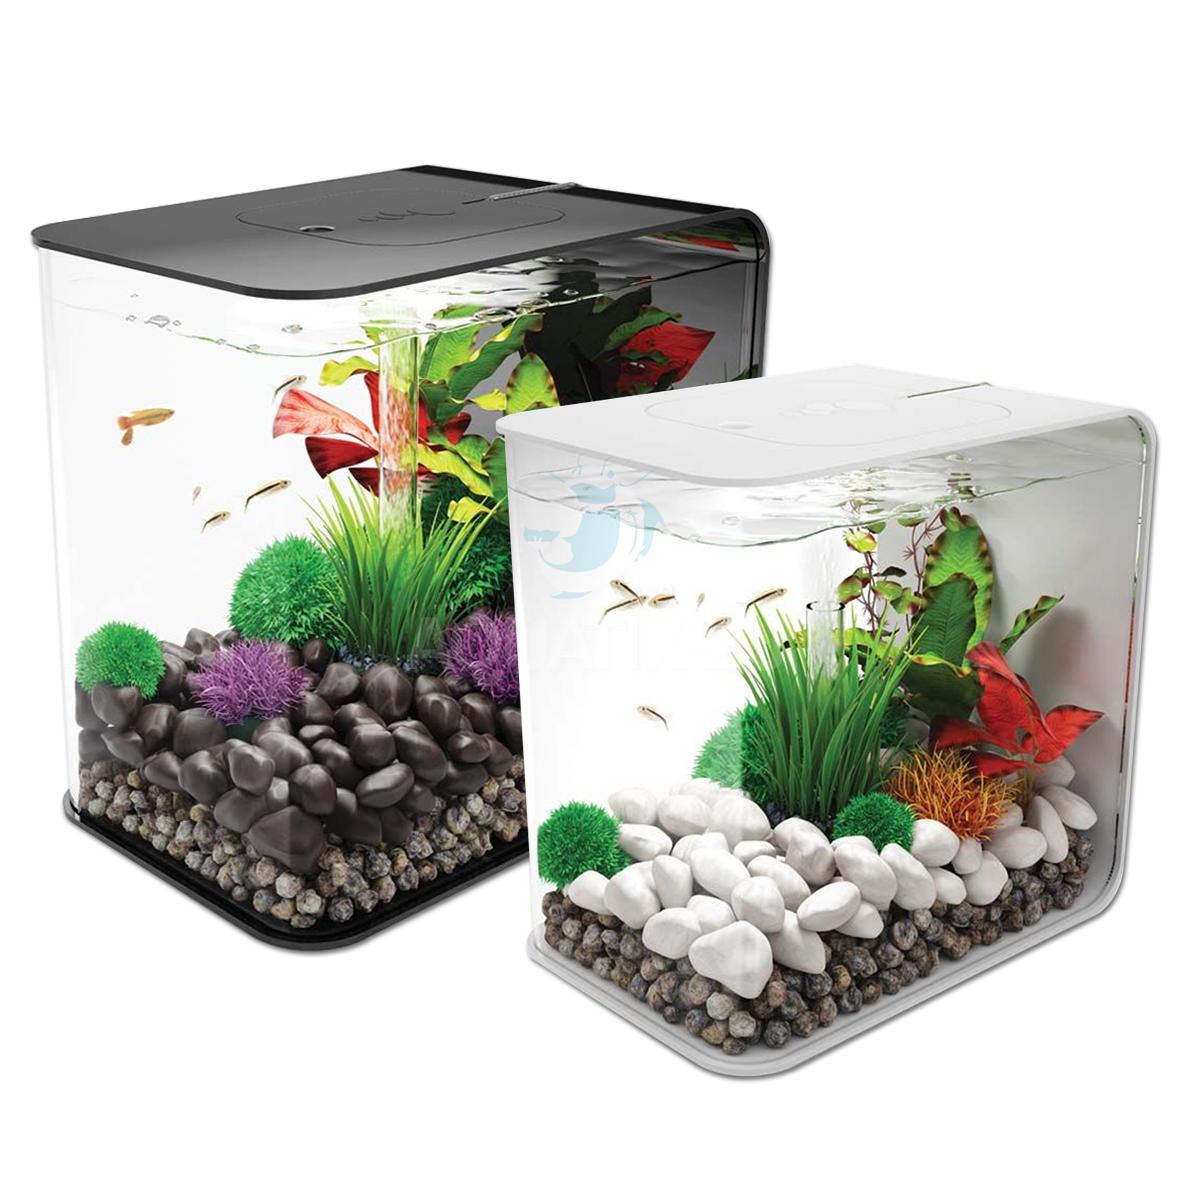 Cabinet aquarium fish tank tropical 60cm 2ft 100l - Biorb Flow Aquarium All In One Fish Tank Kit With Filter Led Lighting 15l 30l